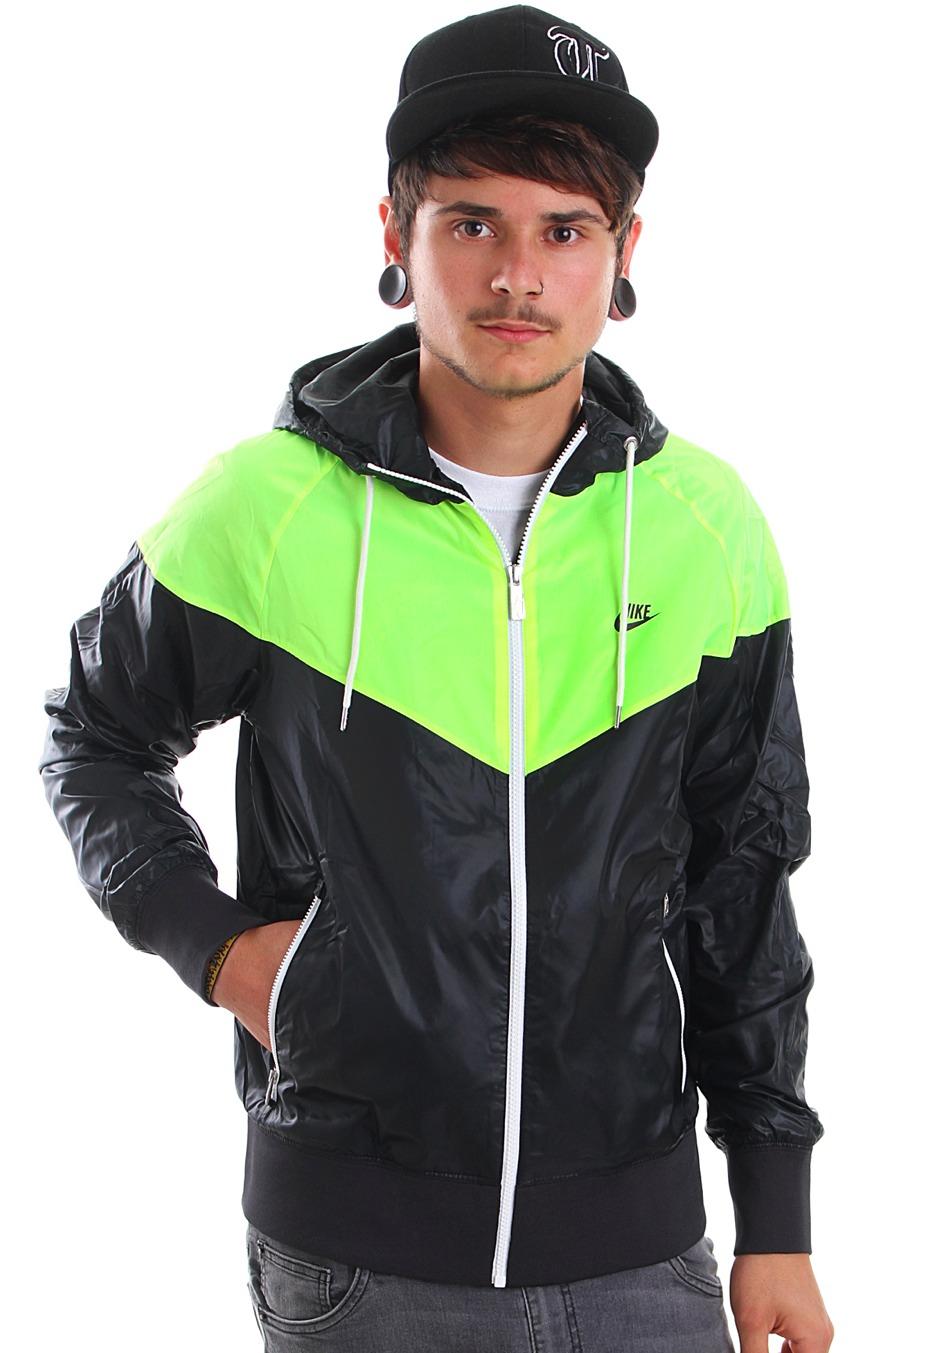 680bbf92cdc9 Nike - The Windrunner Black Volt Black - Windbreaker - Streetwear Shop -  Impericon.com UK